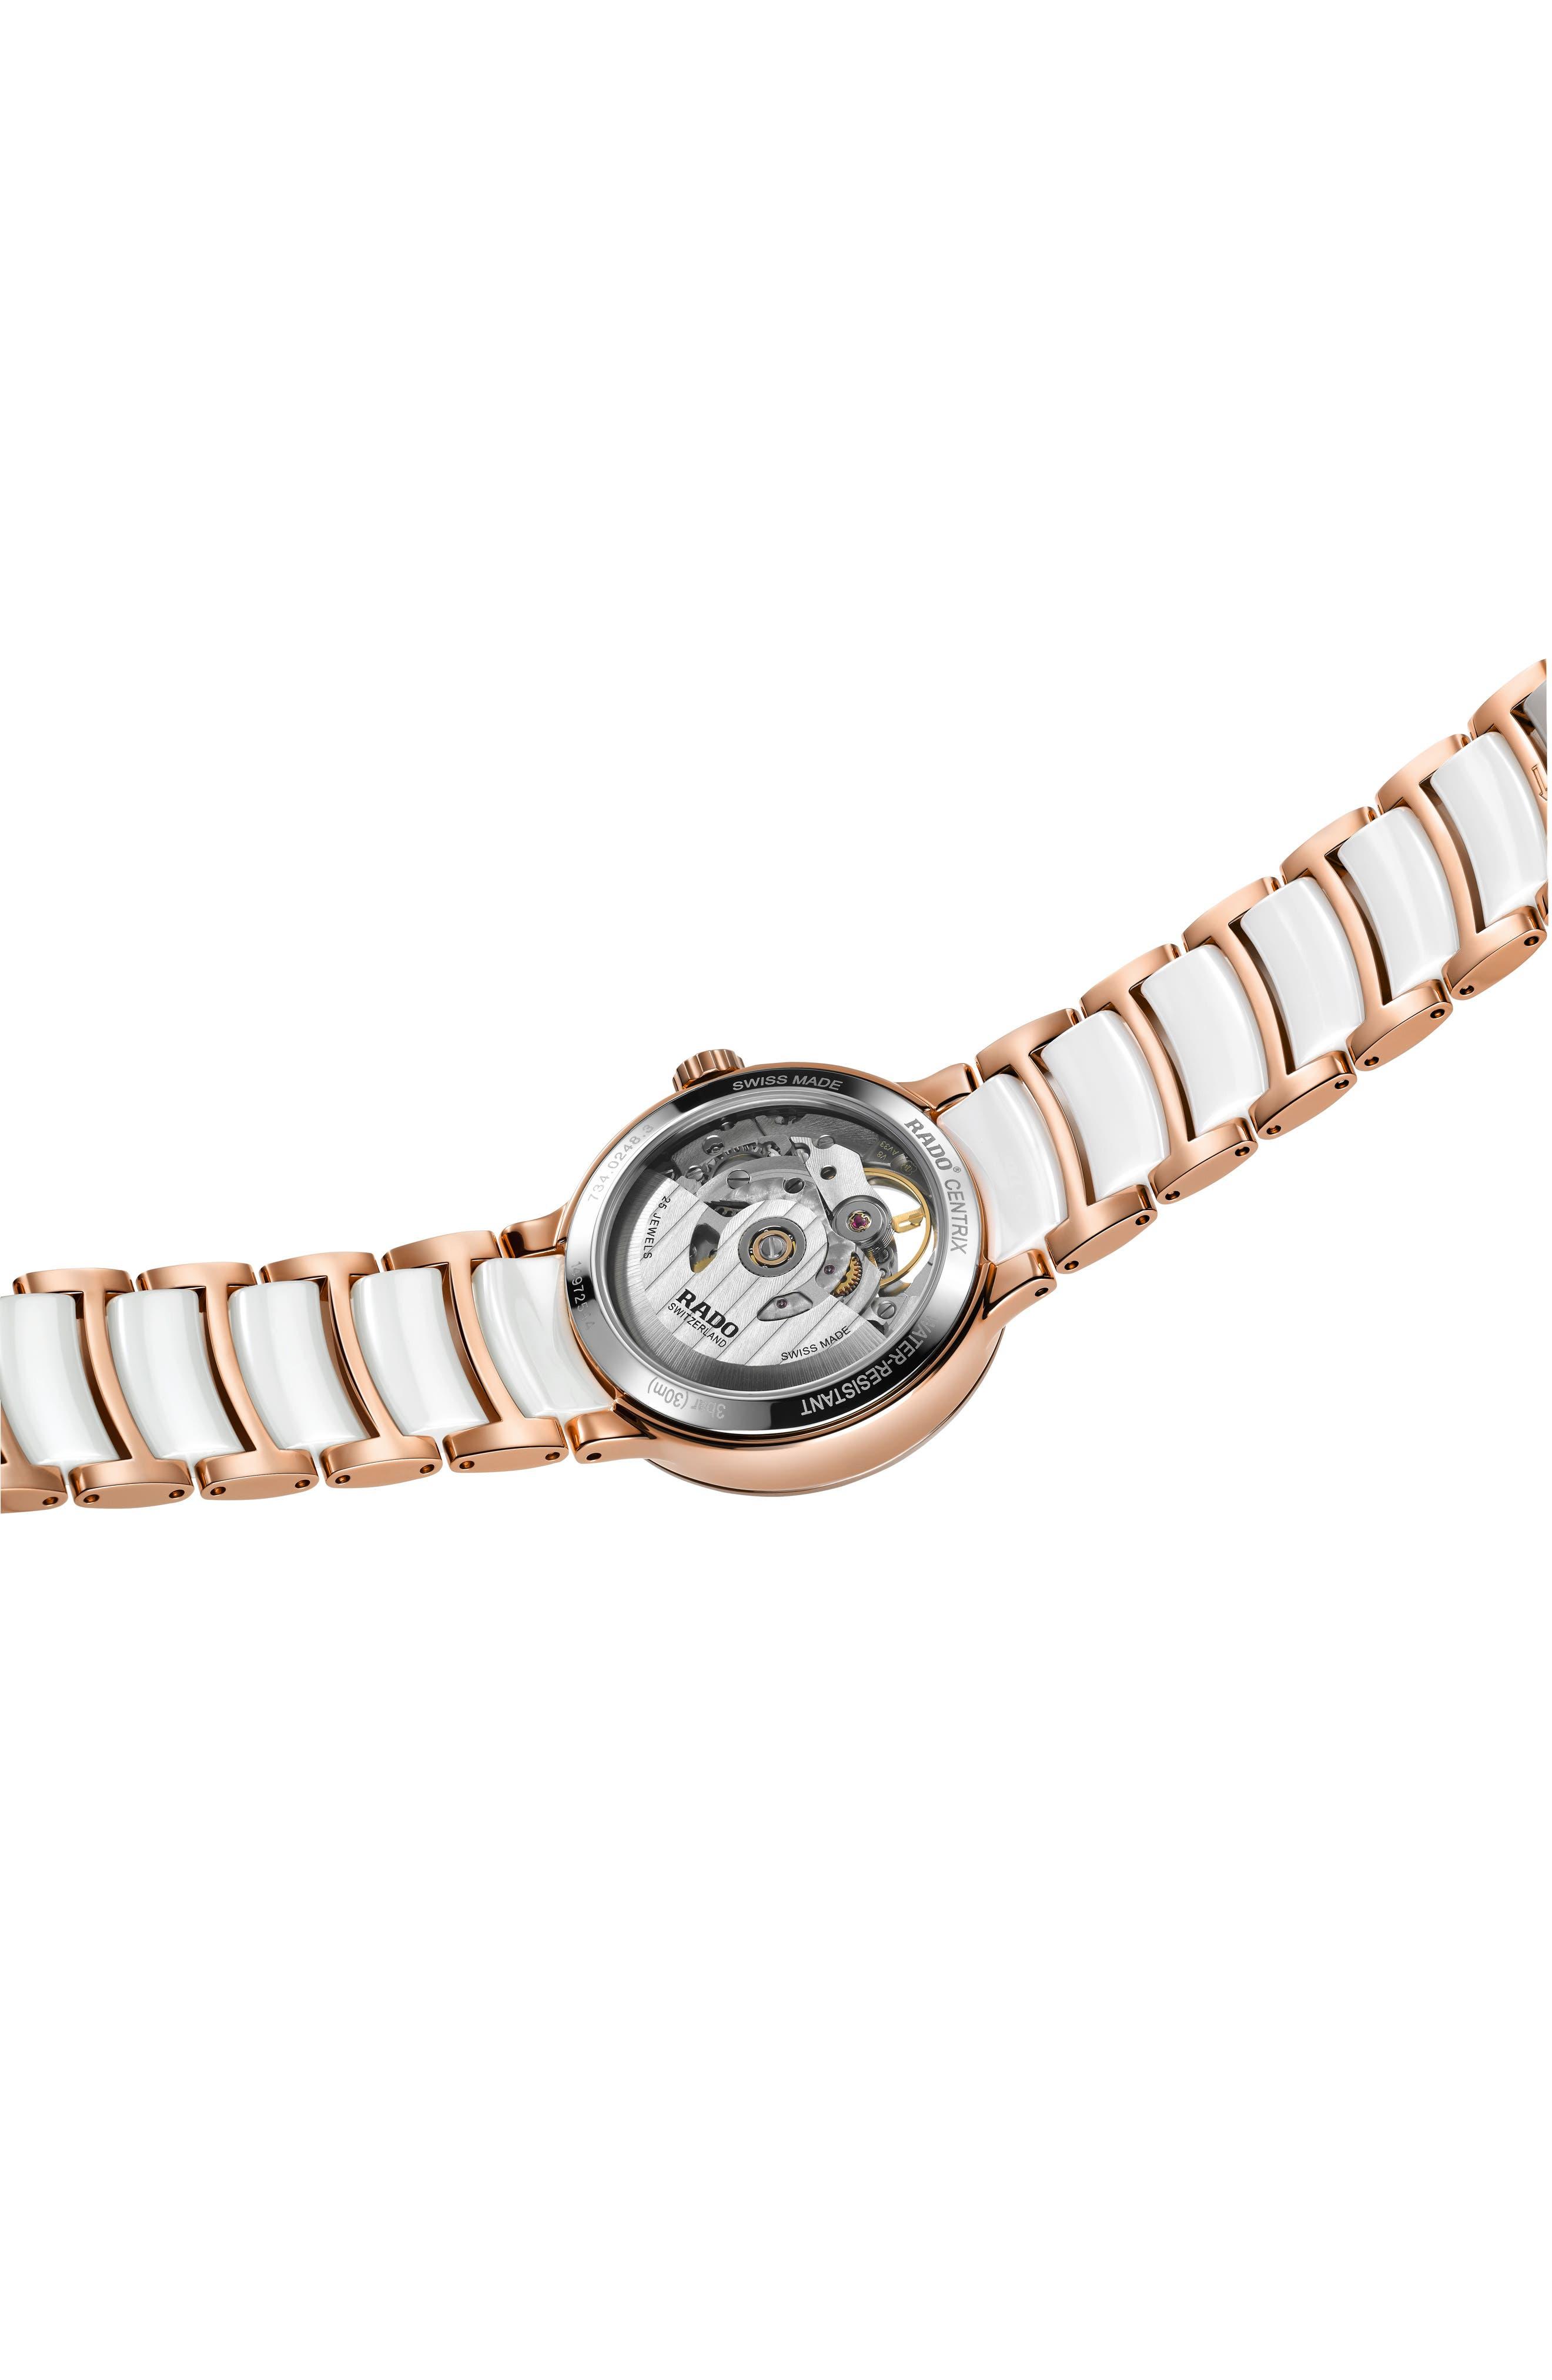 RADO,                             Centrix Open Heart Automatic Diamond Ceramic Bracelet Watch, 33mm,                             Alternate thumbnail 4, color,                             WHITE/ MOP/ ROSE GOLD